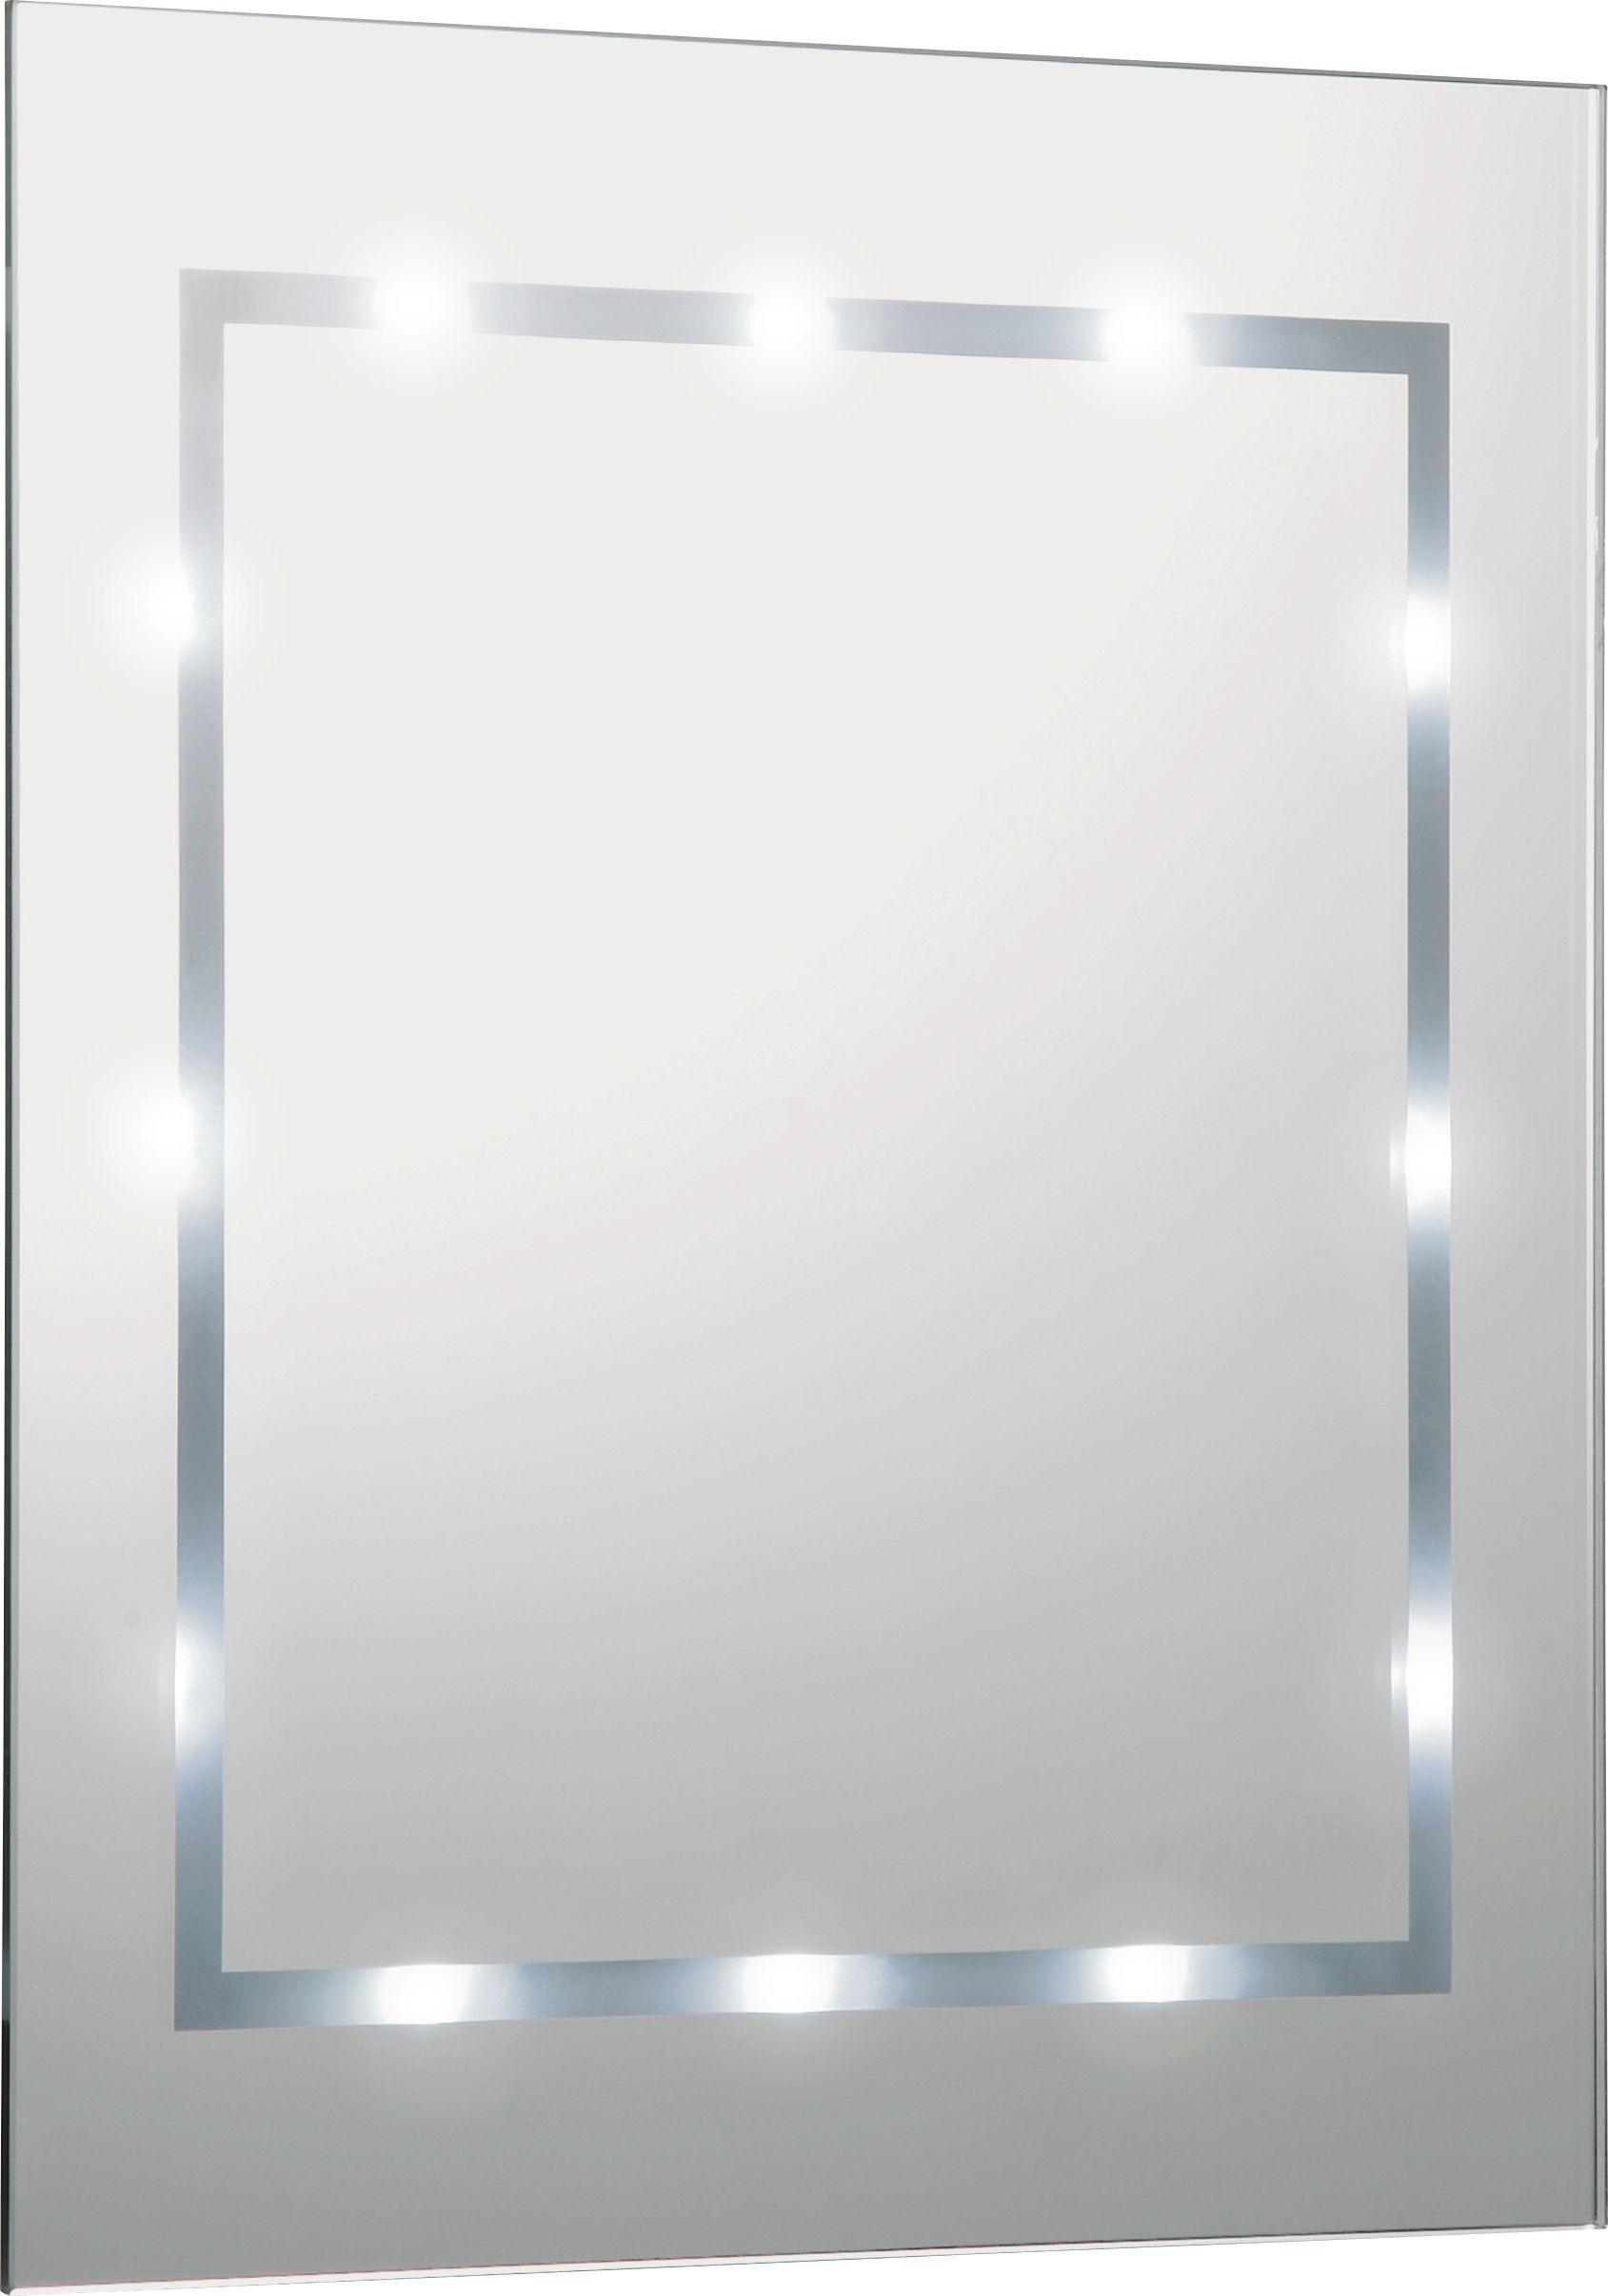 bath lights argos. buy home rectangular illuminated bathroom mirror - white gloss at argos.co.uk your online shop for mirrors, home furnishings, and garden. bath lights argos t